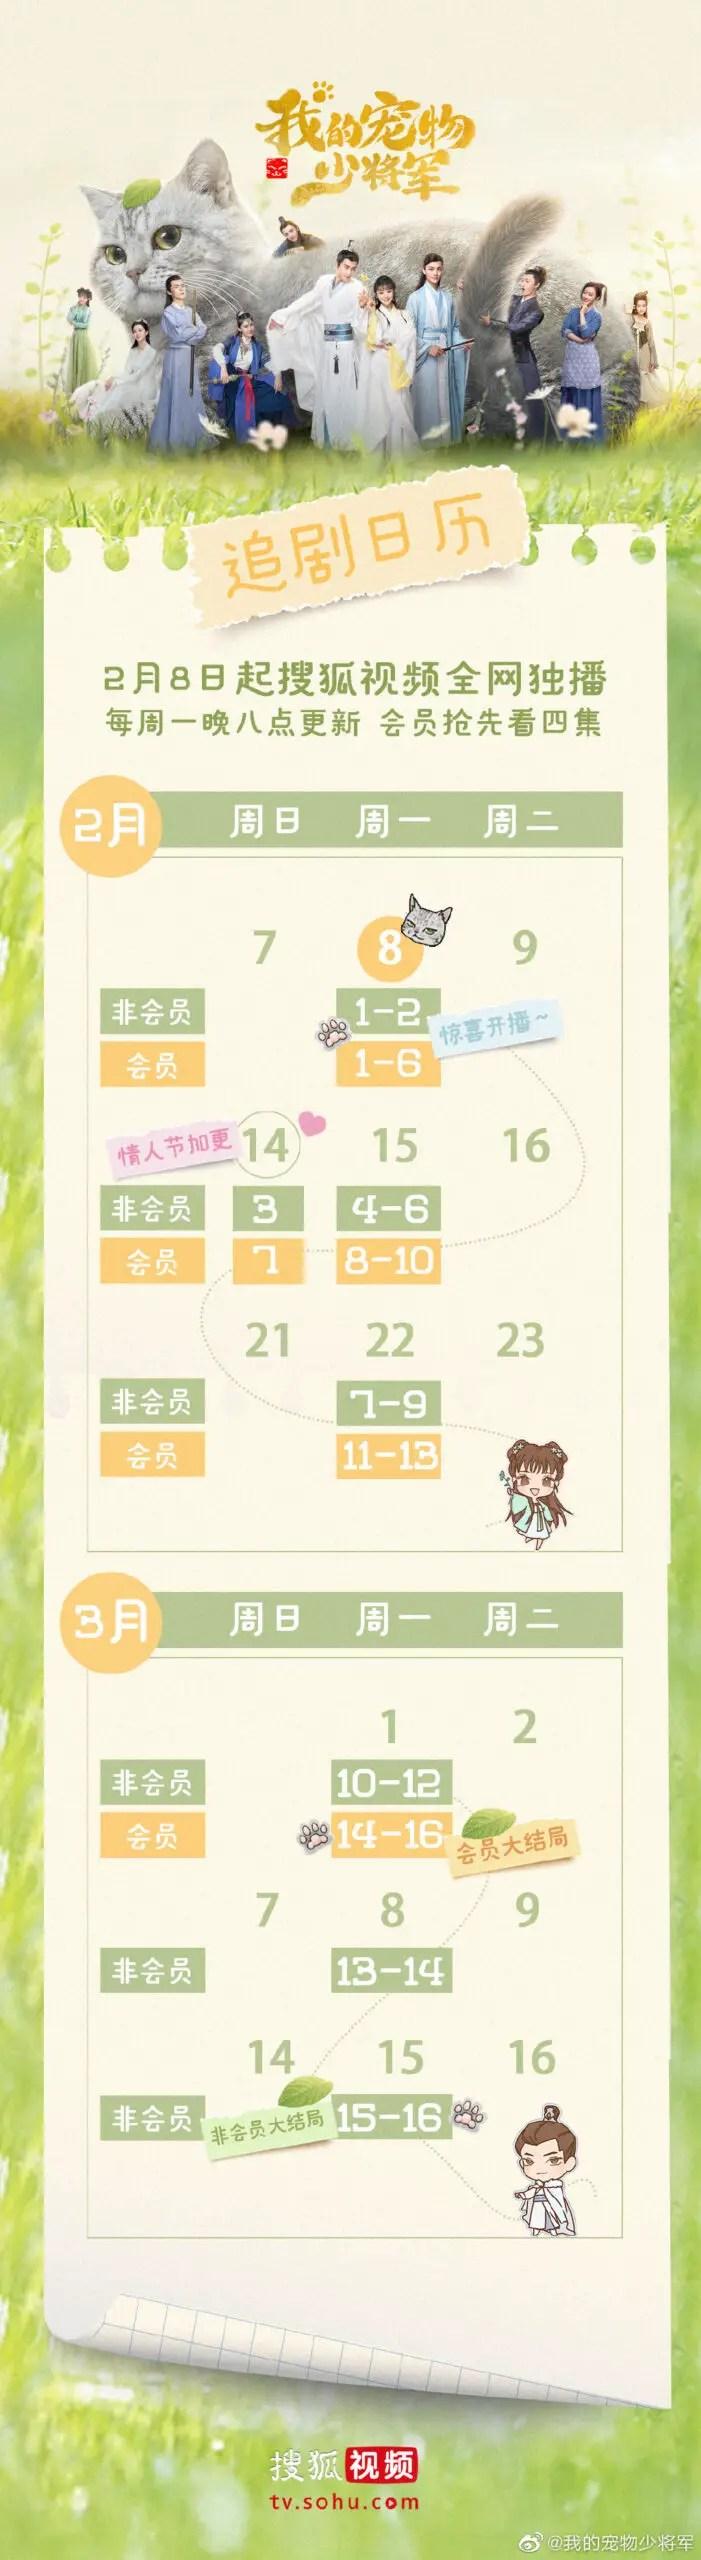 Be My Cat Chinese Drama Airing Calendar